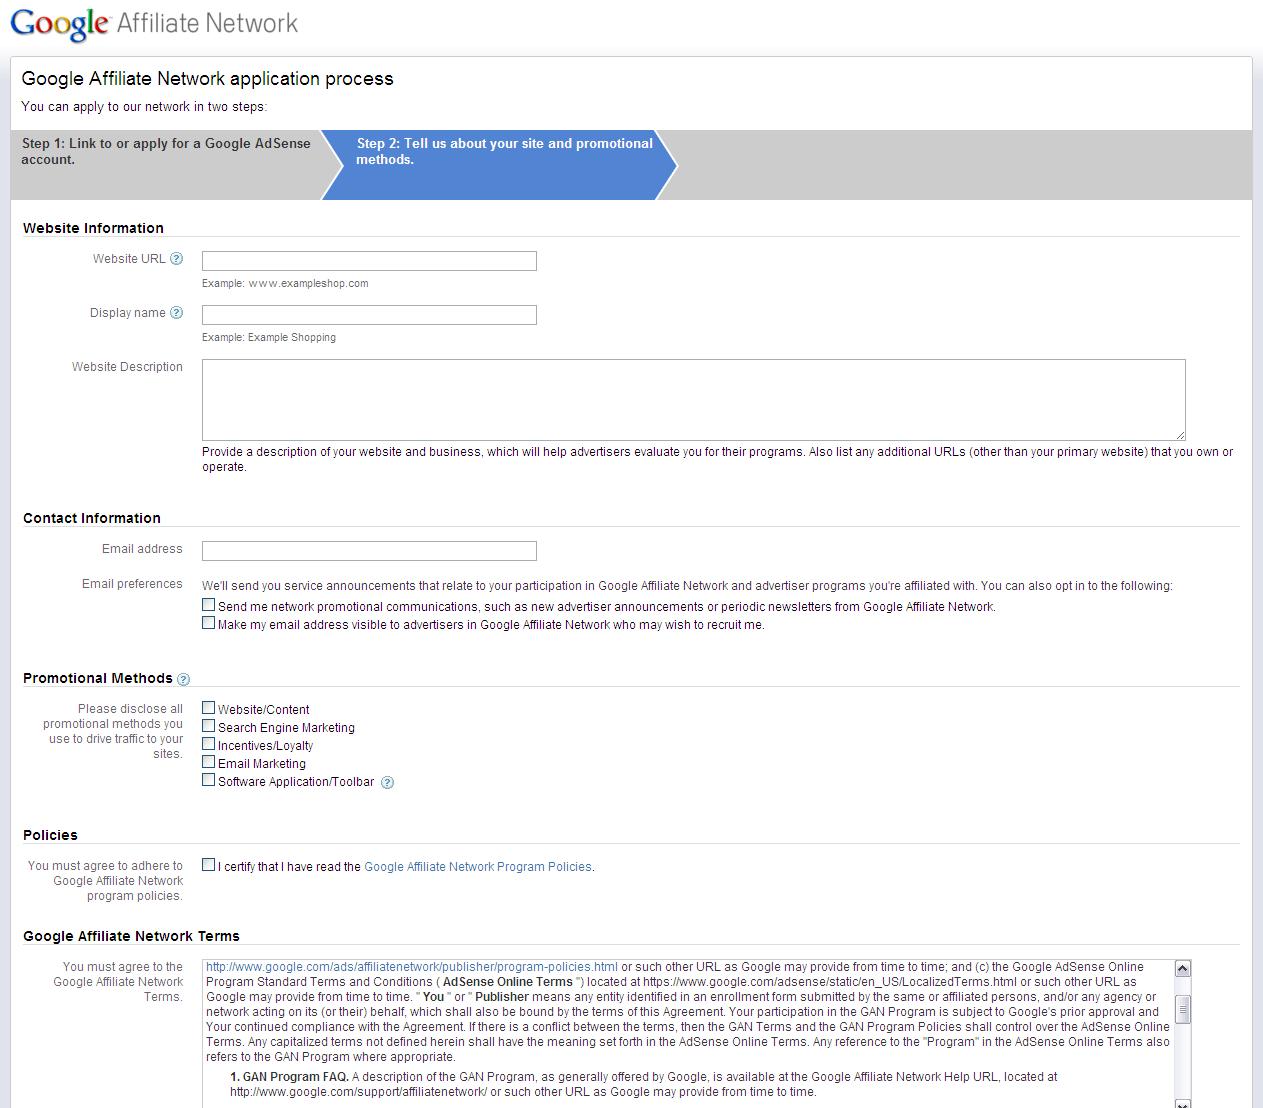 Google%2BAffiliate%2BNetwork Step%2B4 Site%2Binfo%2Band%2Bpromotional%2Bmethod Jul 21, 2010 max touzokudan suggestions. max touzokudan Best Site!